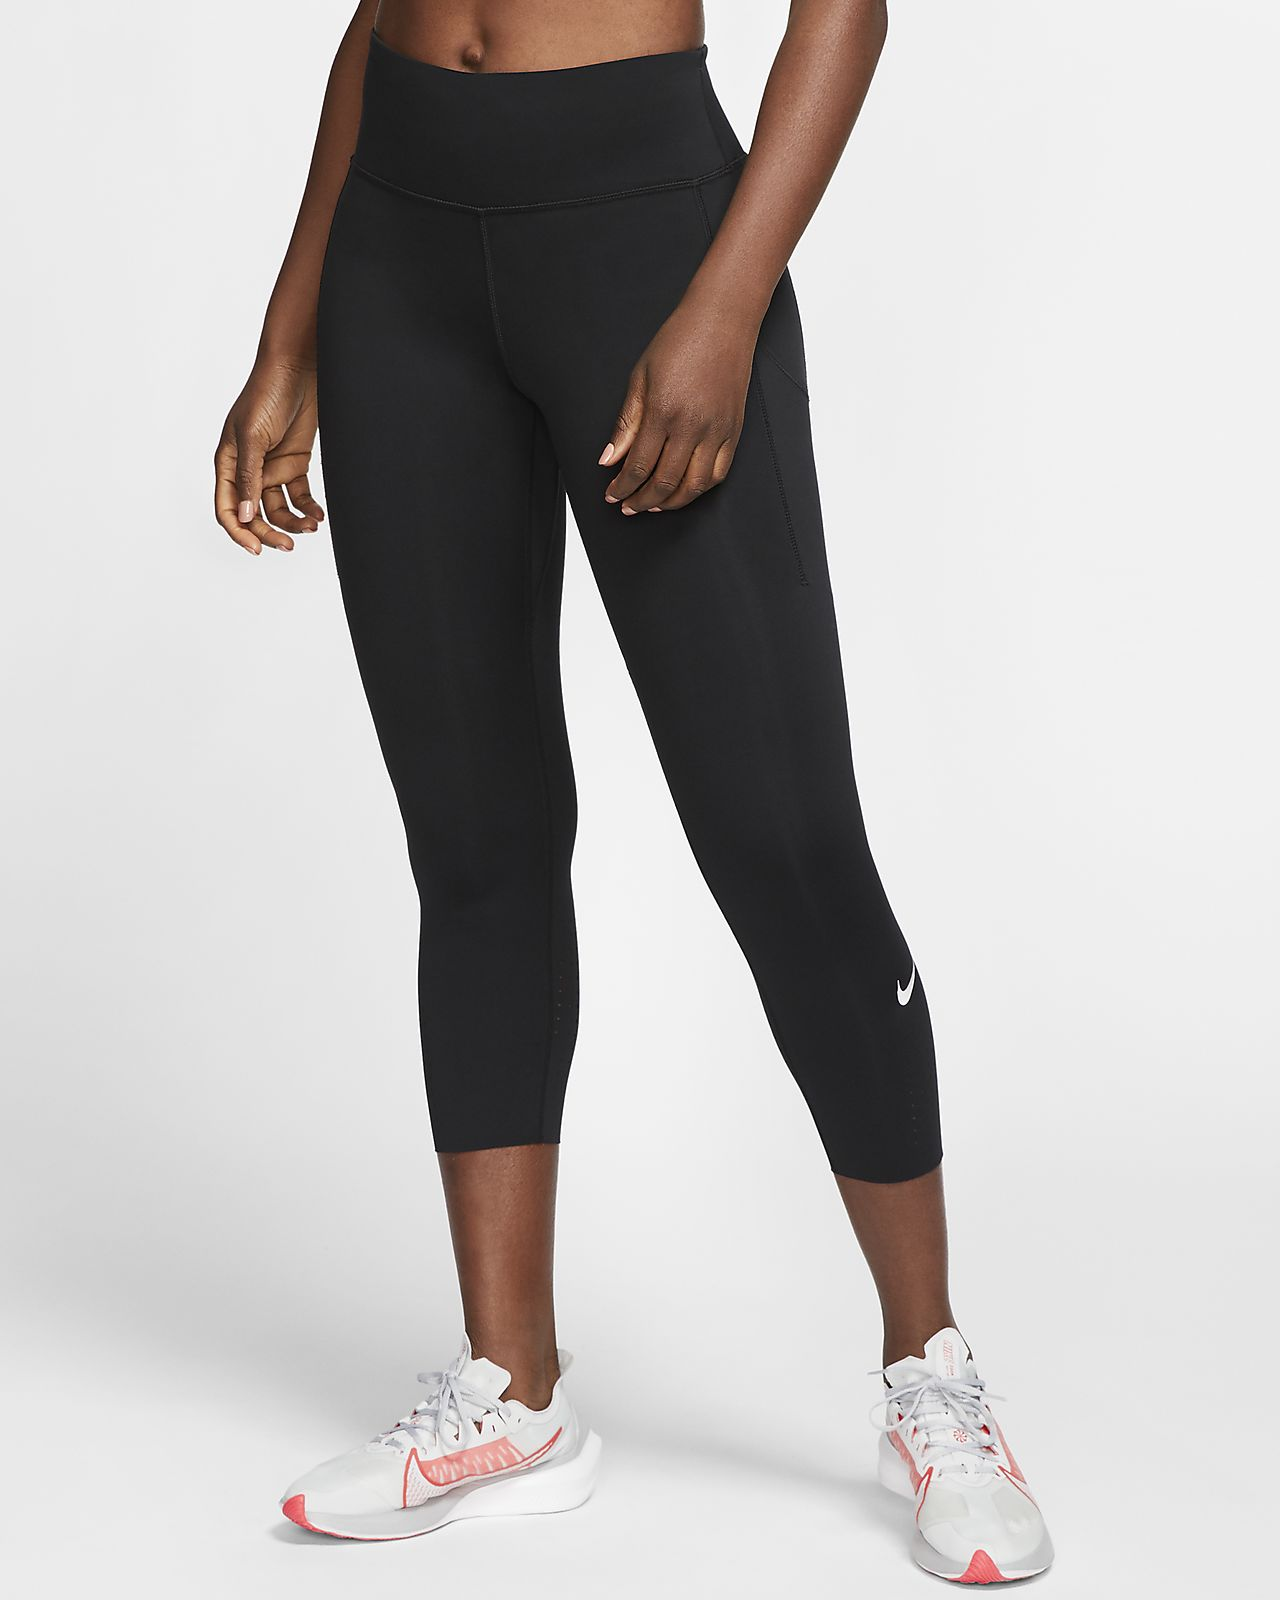 Damskie legginsy do biegania 3/4 Nike Epic Luxe